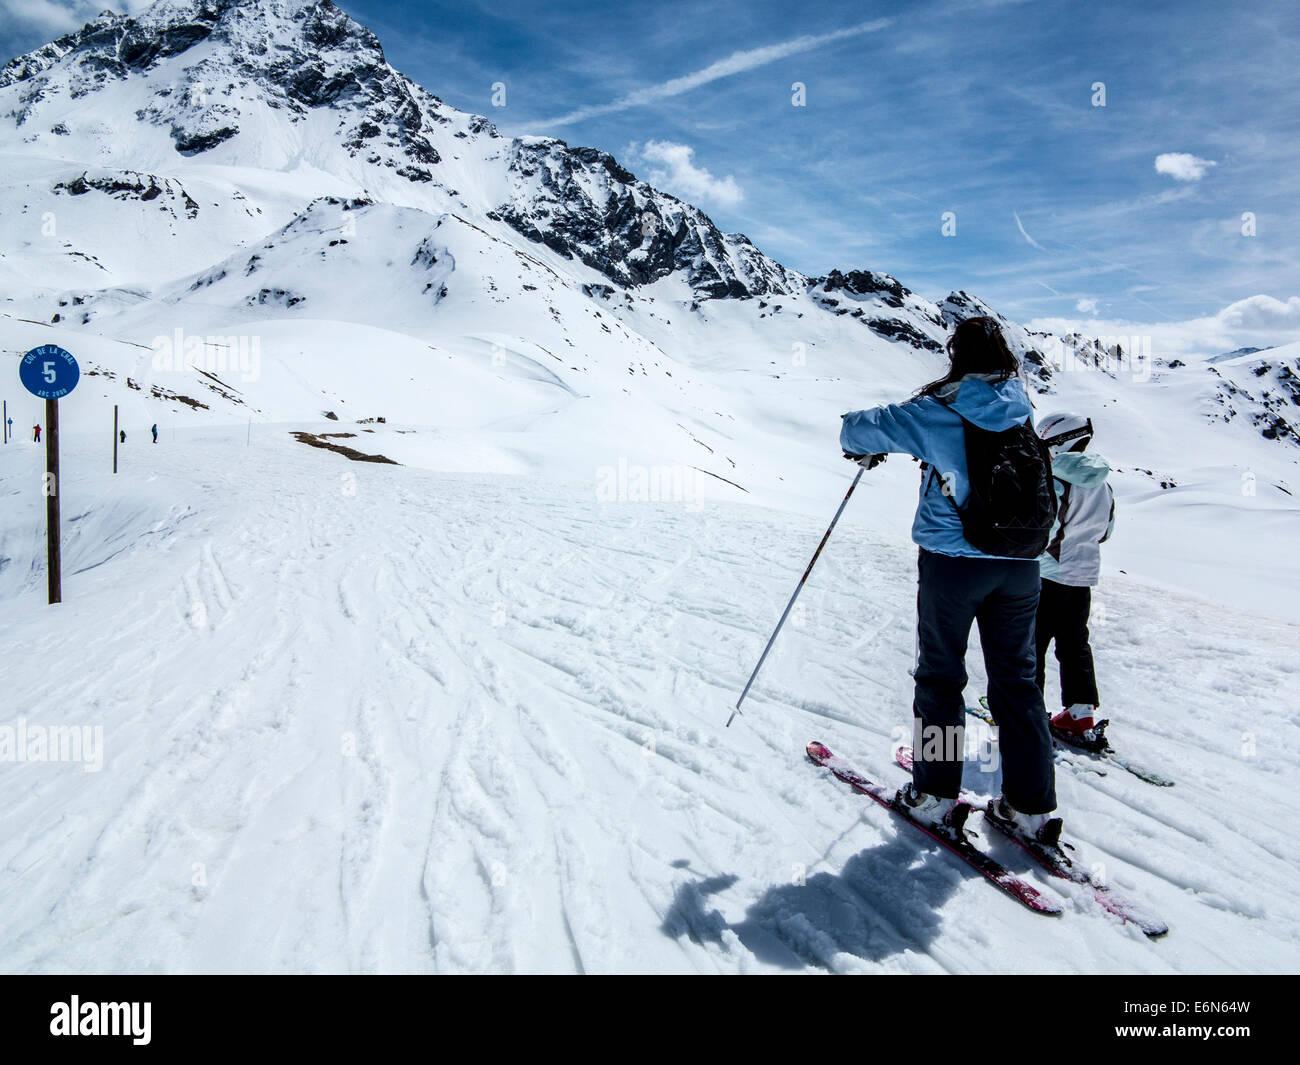 Col de la Chal run in Les Arcs 2000 ski resort, Les Arcs, Savoie, Rhone Alpes, France - Stock Image